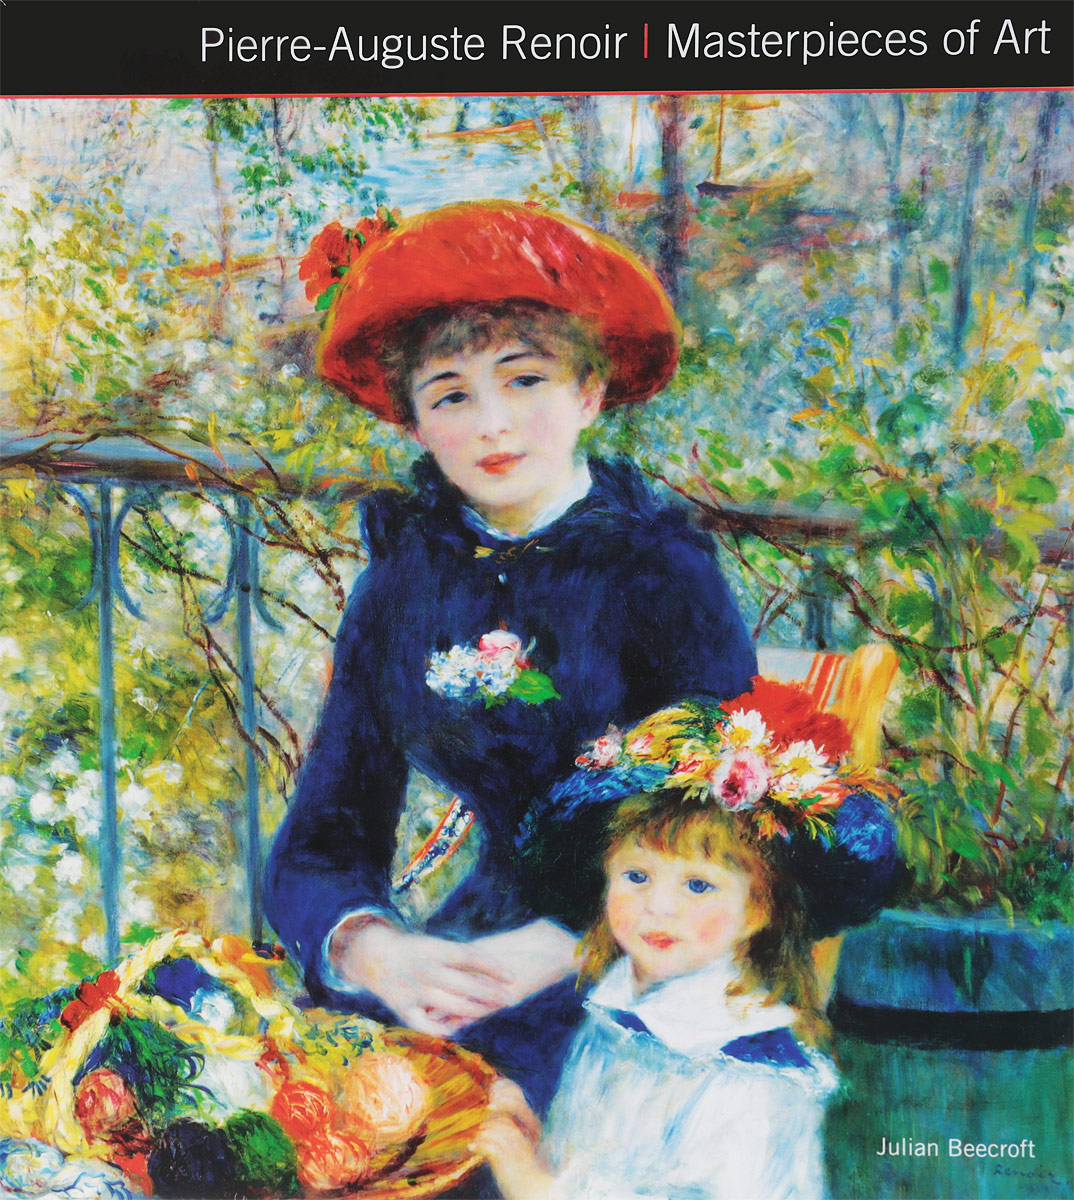 Pierre-Auguste Renoir (Masterpieces of Art Series 1000 masterpieces of decorative art